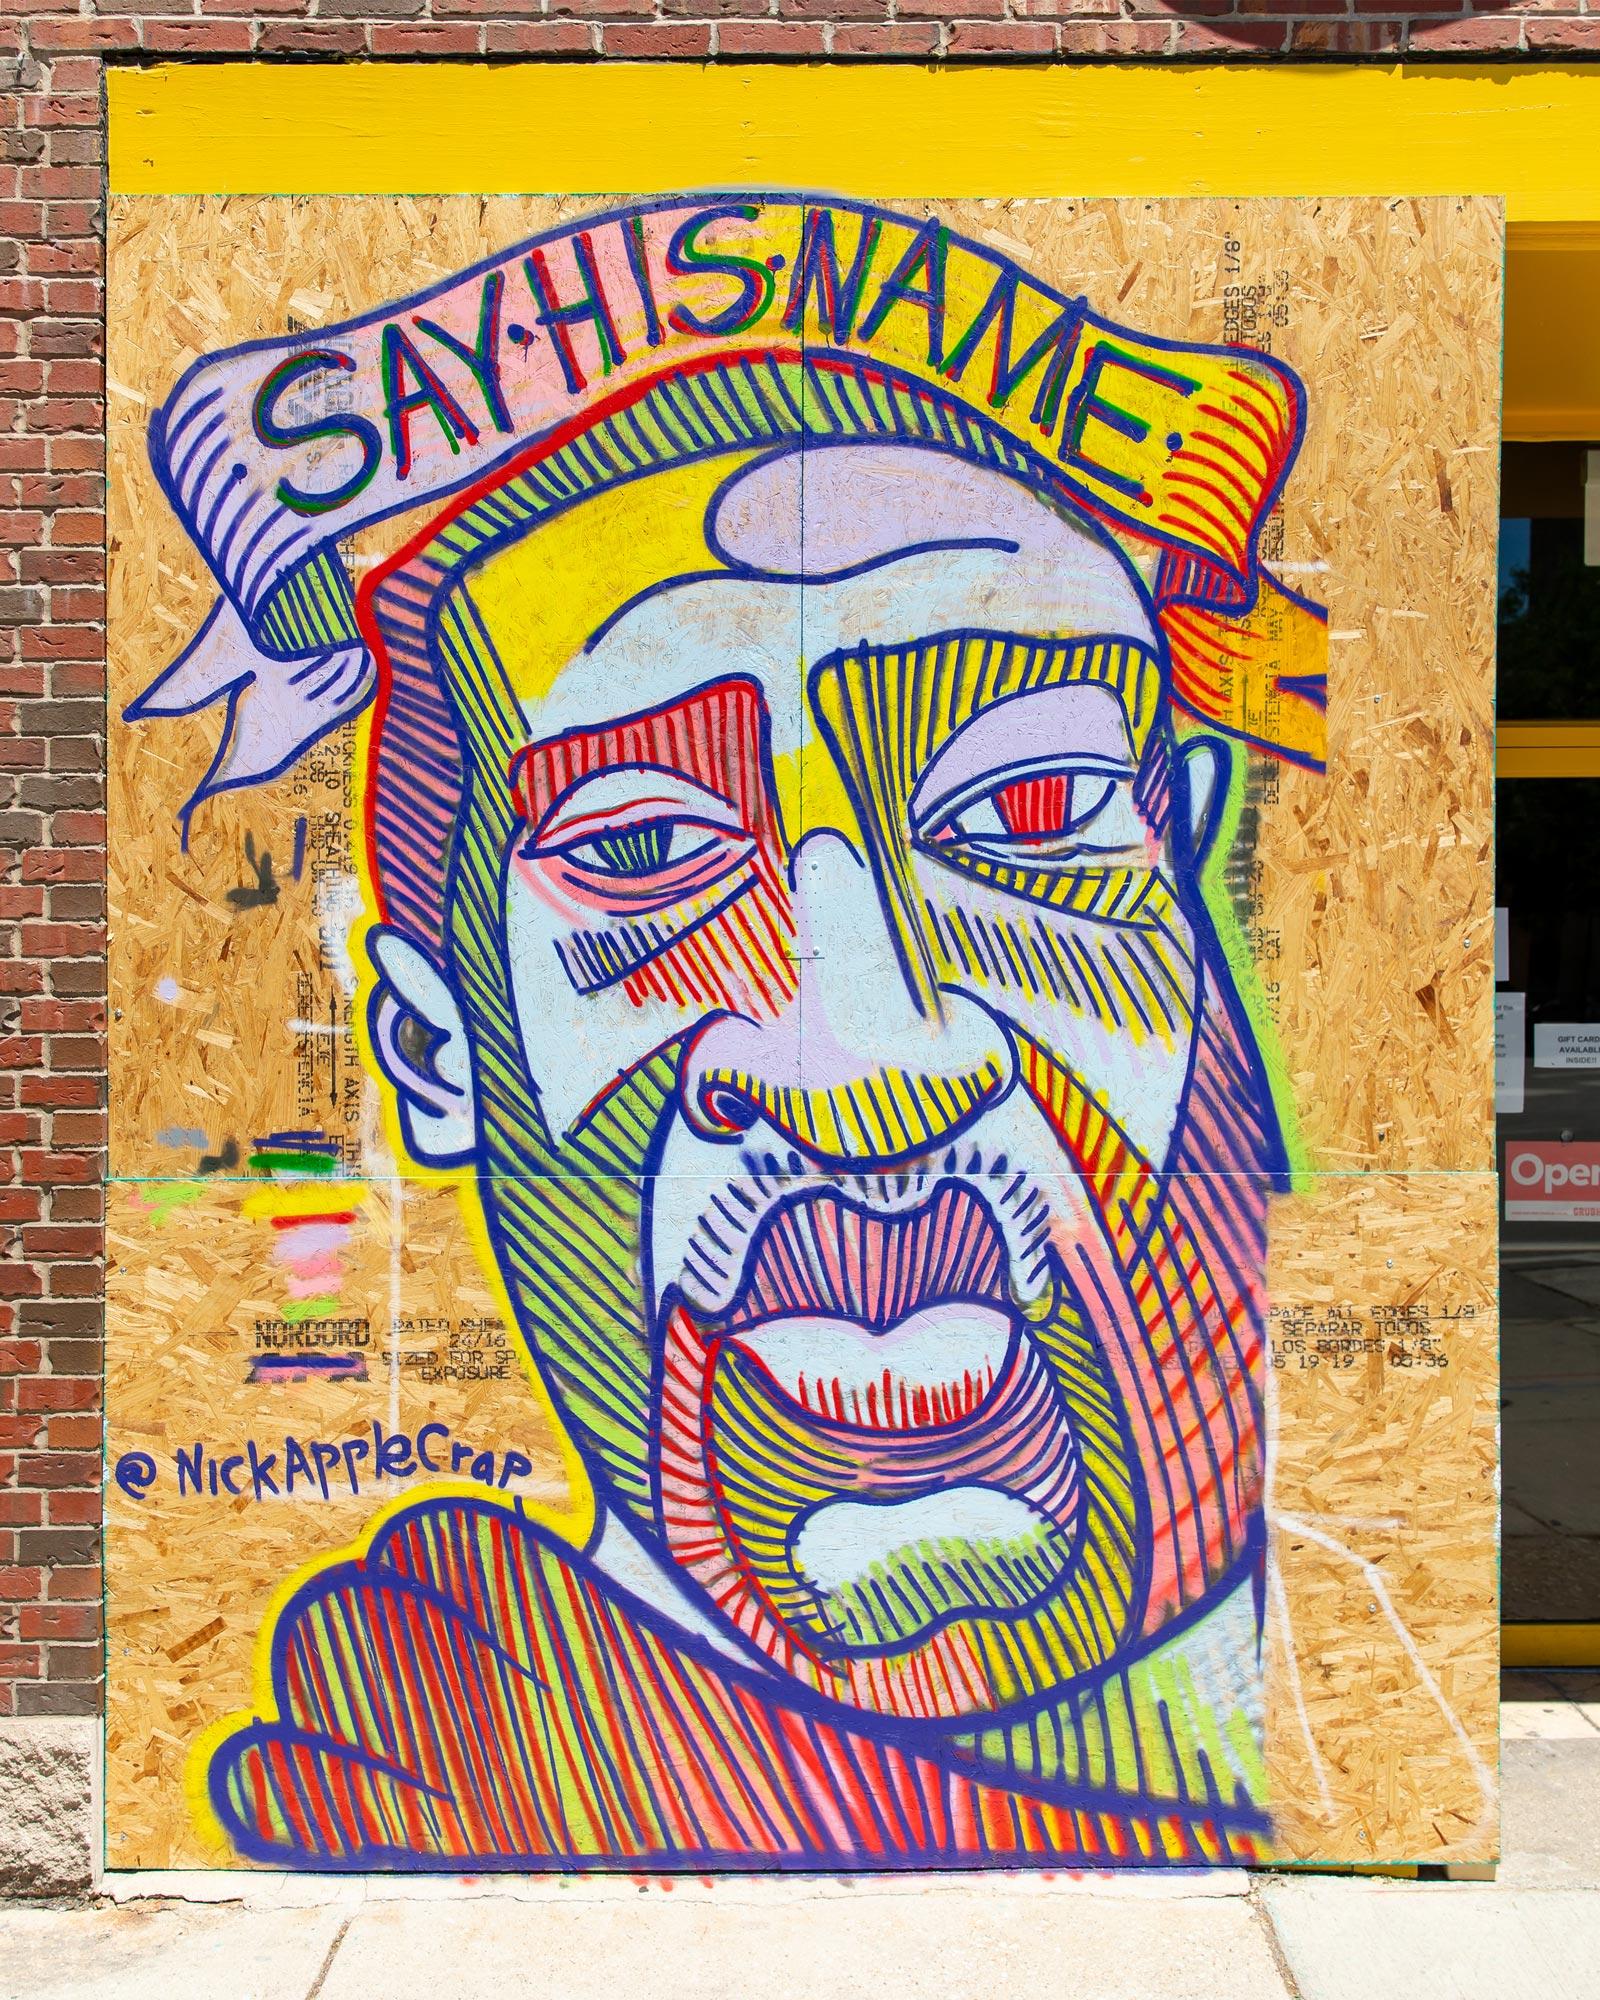 Nick Applecrap George Floyd Mural Chicago